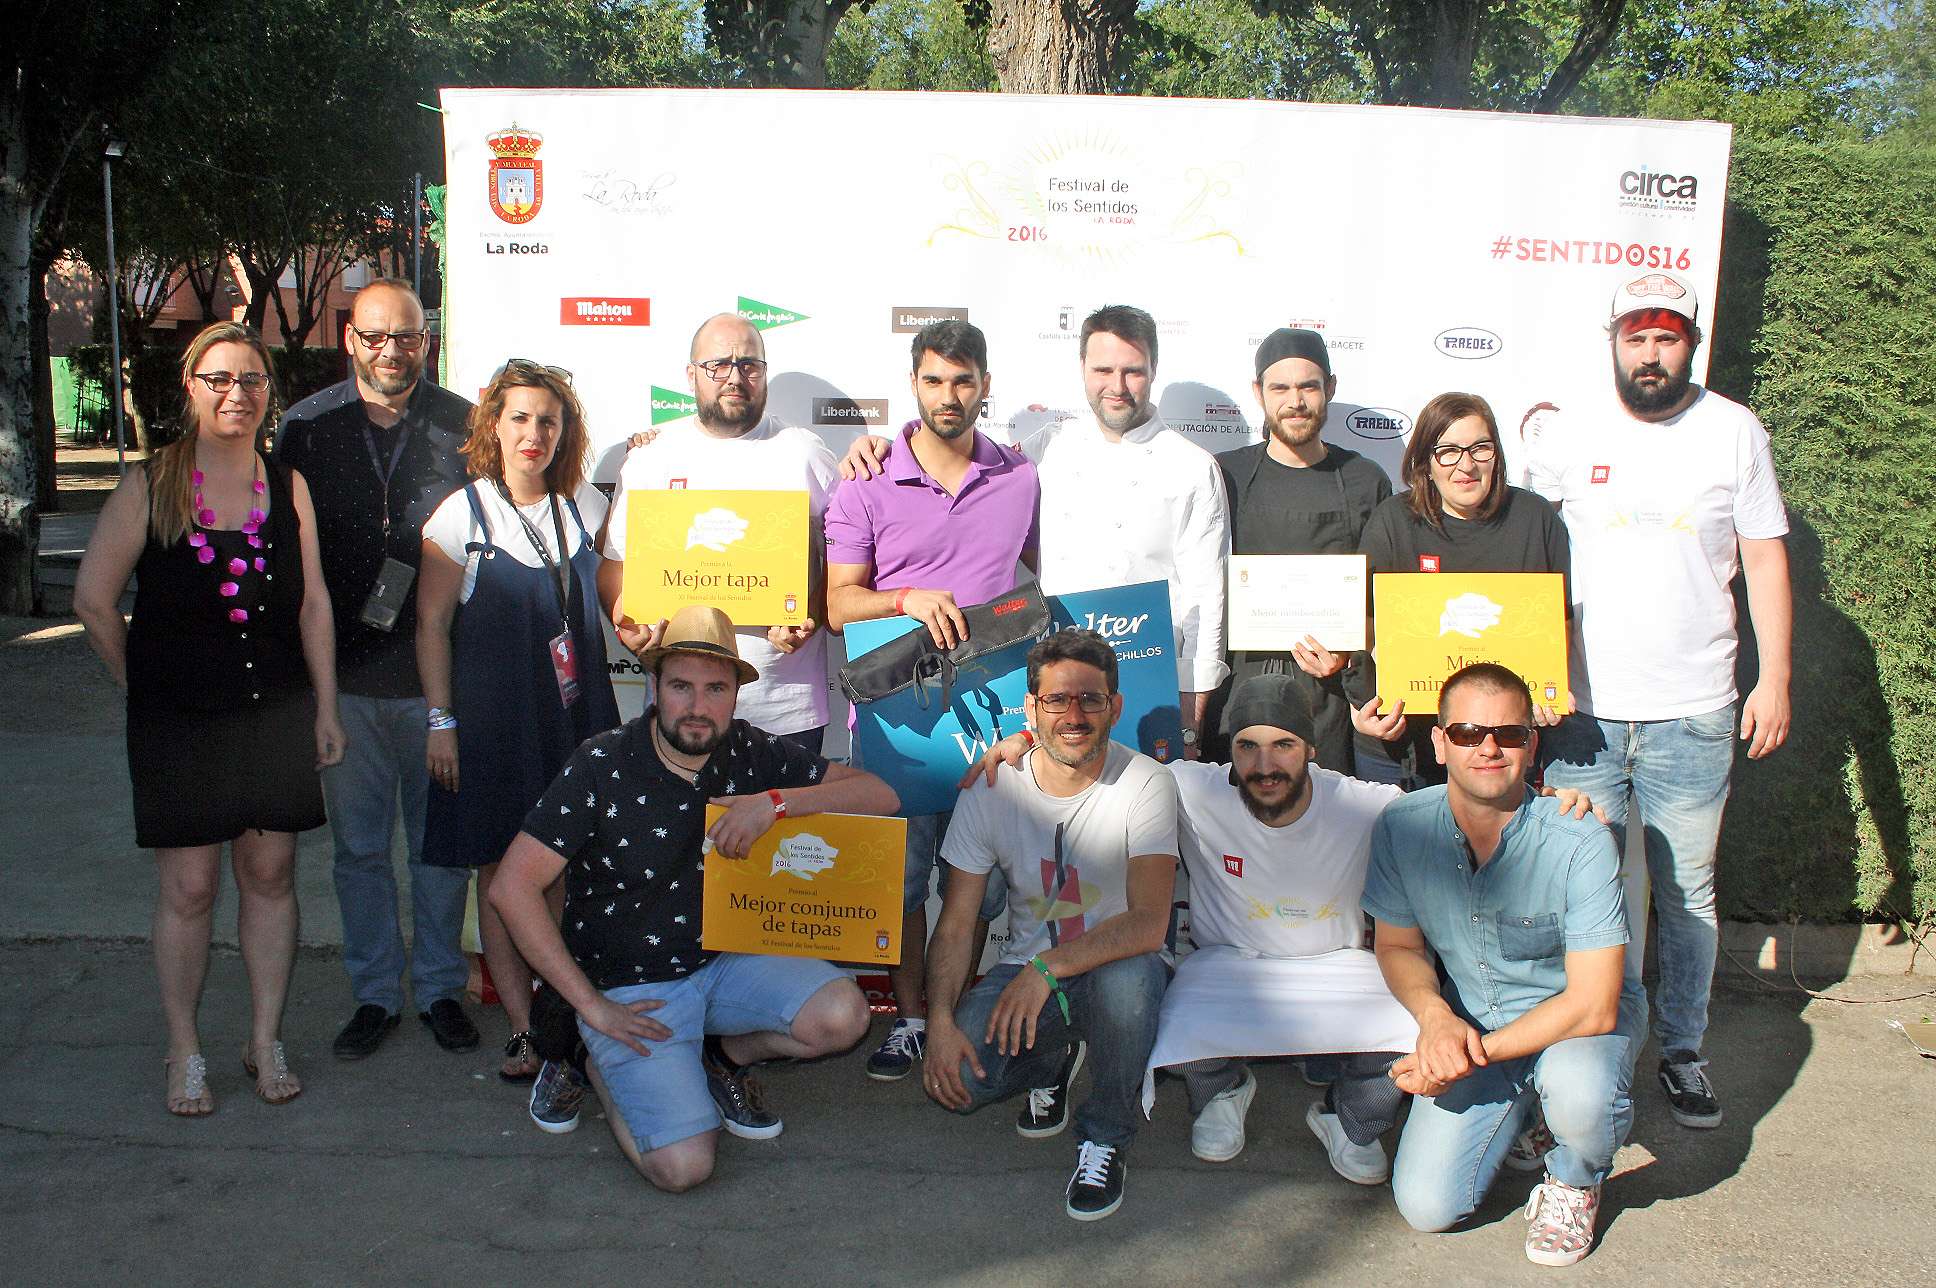 Premios Tapa #Sentidos16